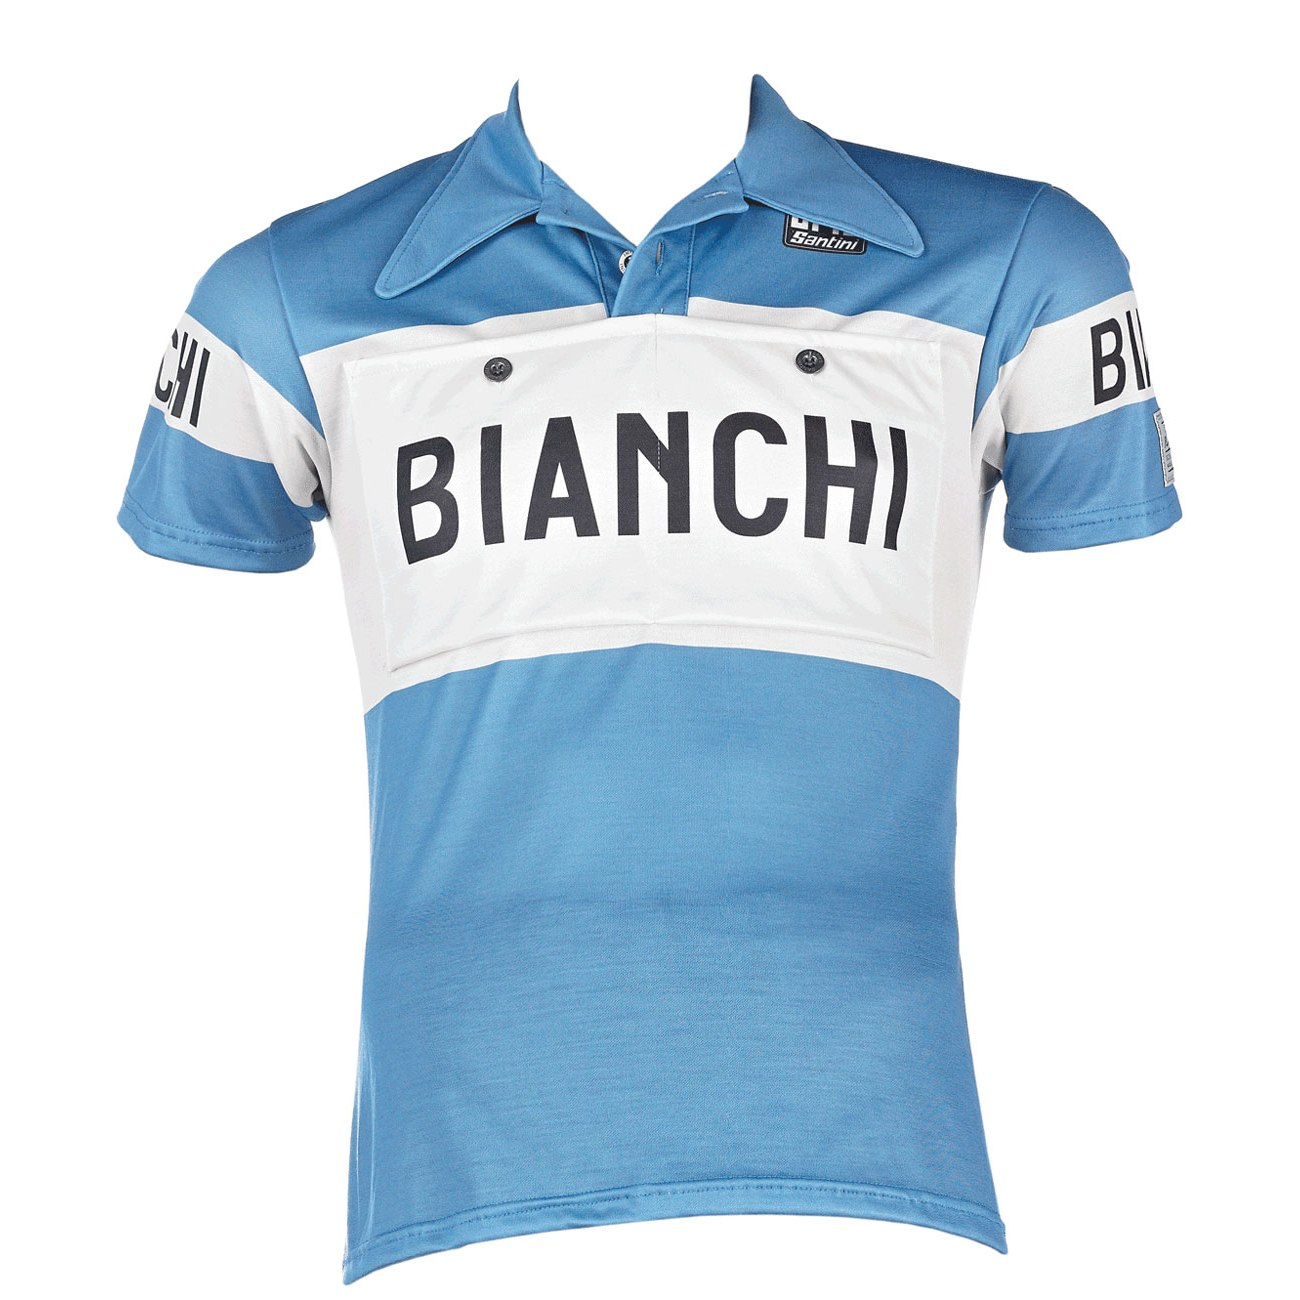 Bianchi Eroica Merino Wool Short Sleeve Jersey - blue